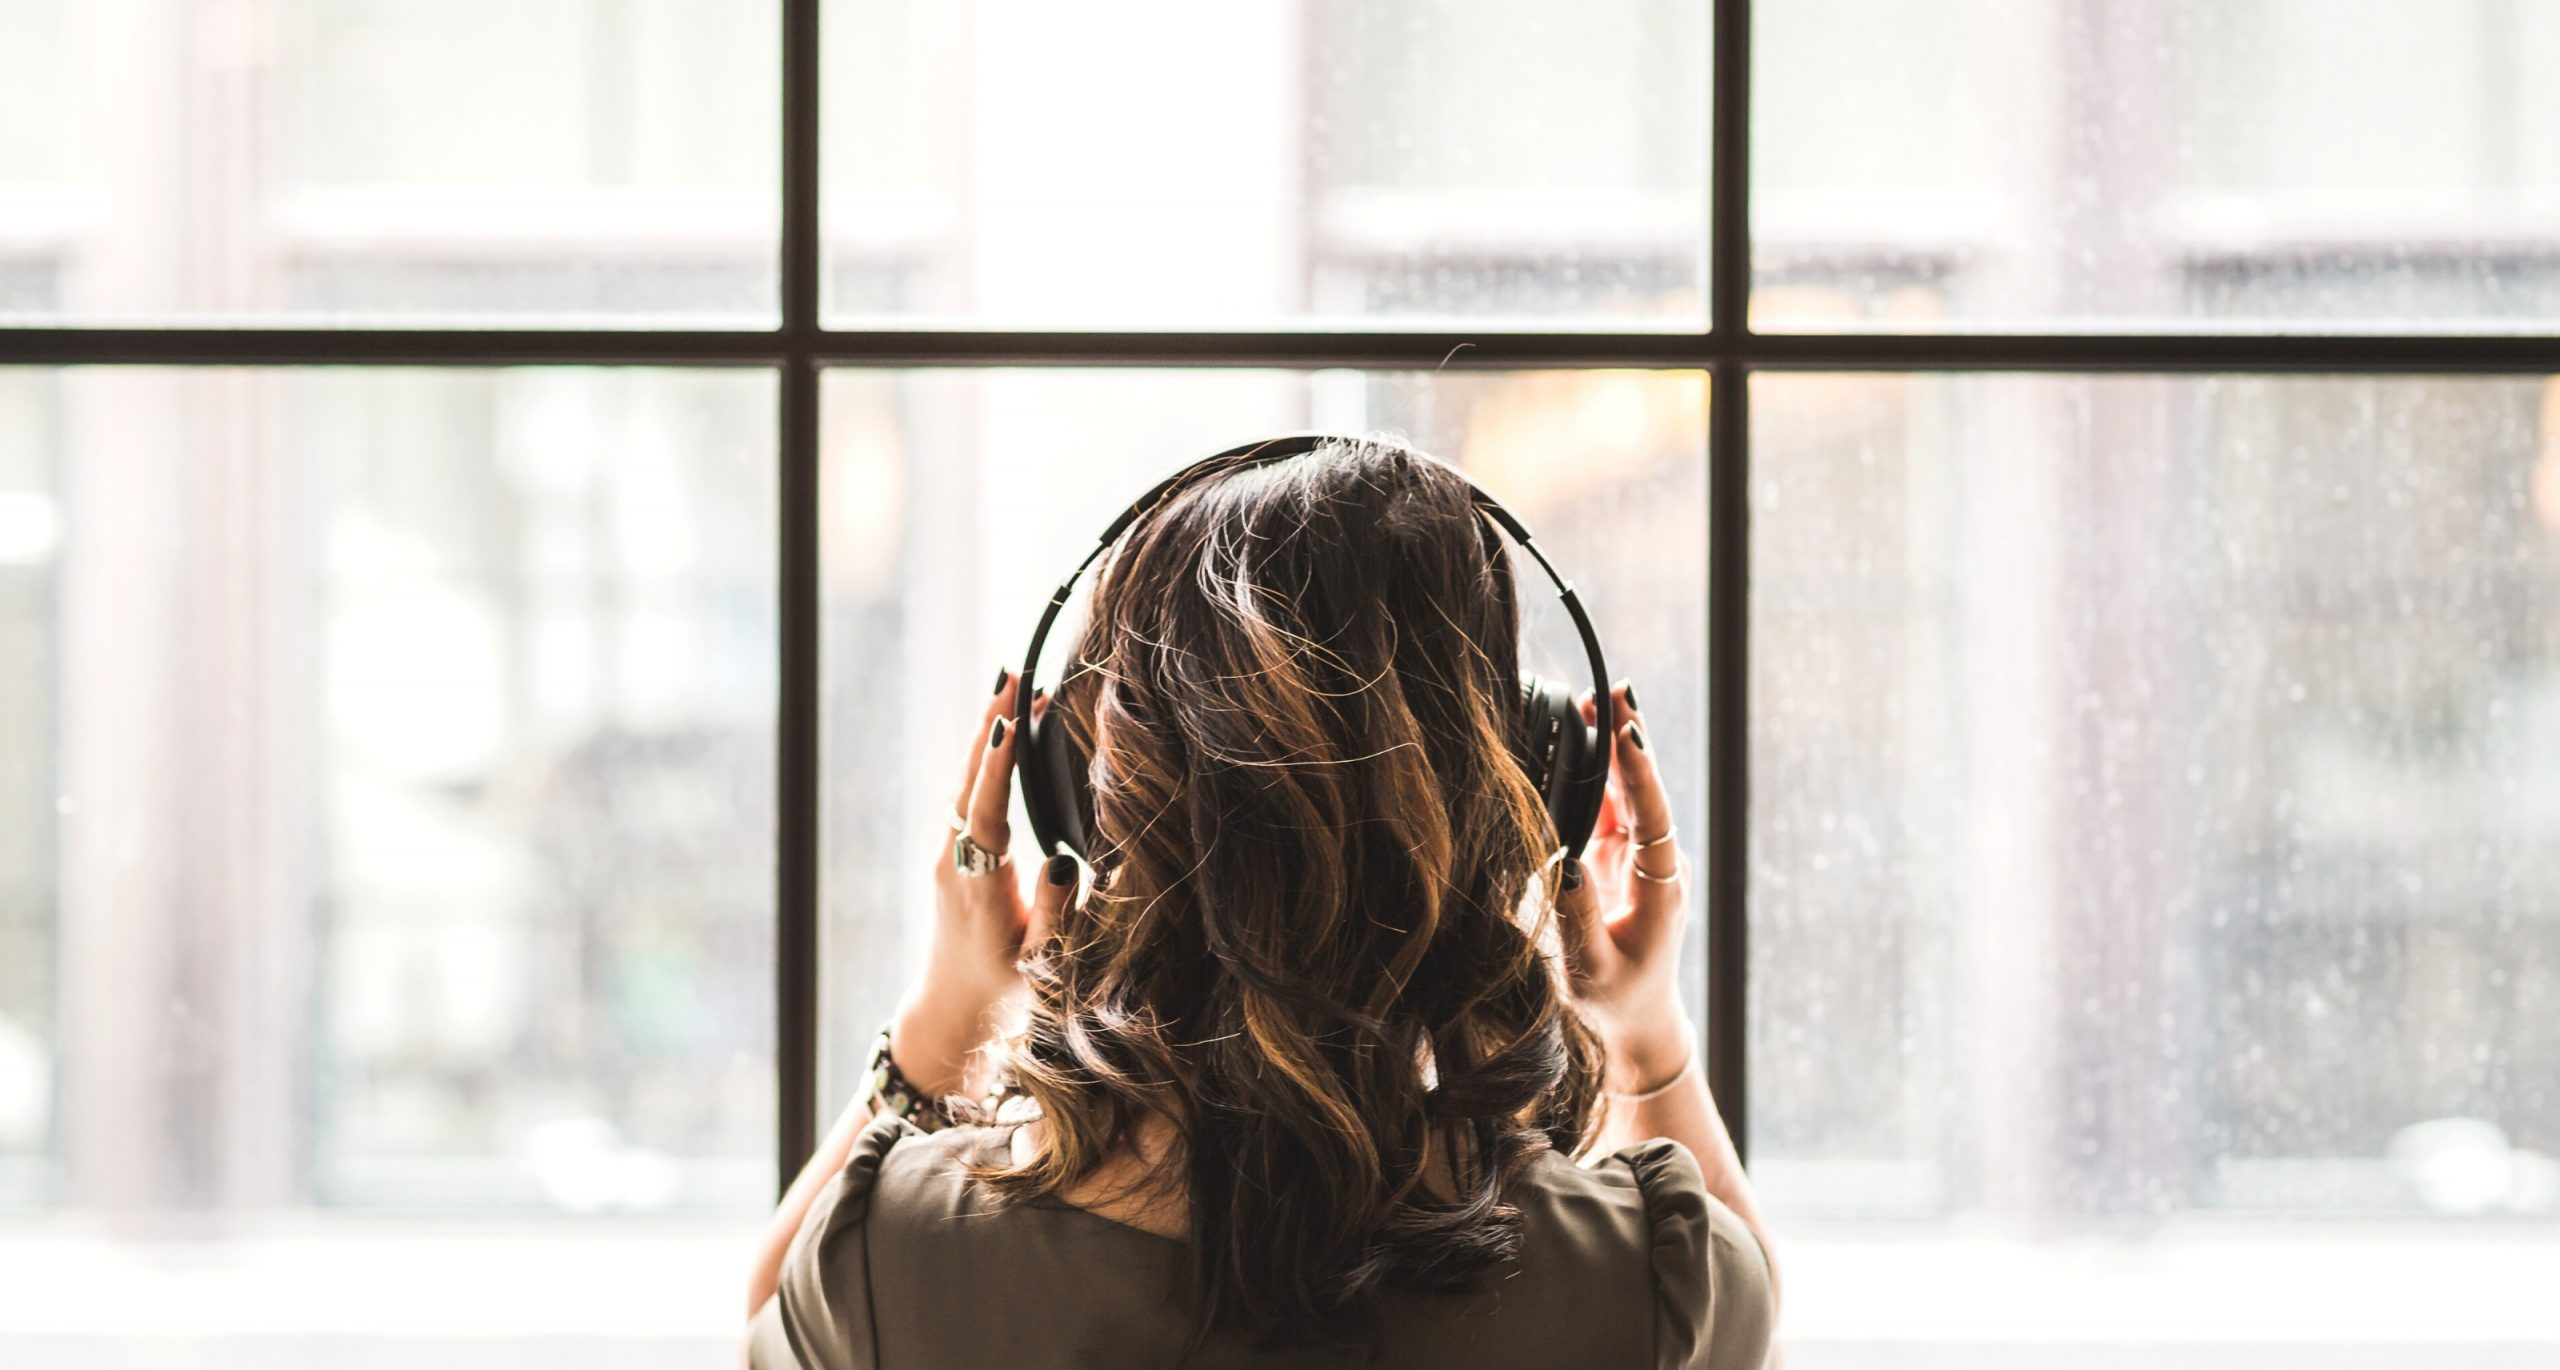 Podcast PR & Marketing Expert